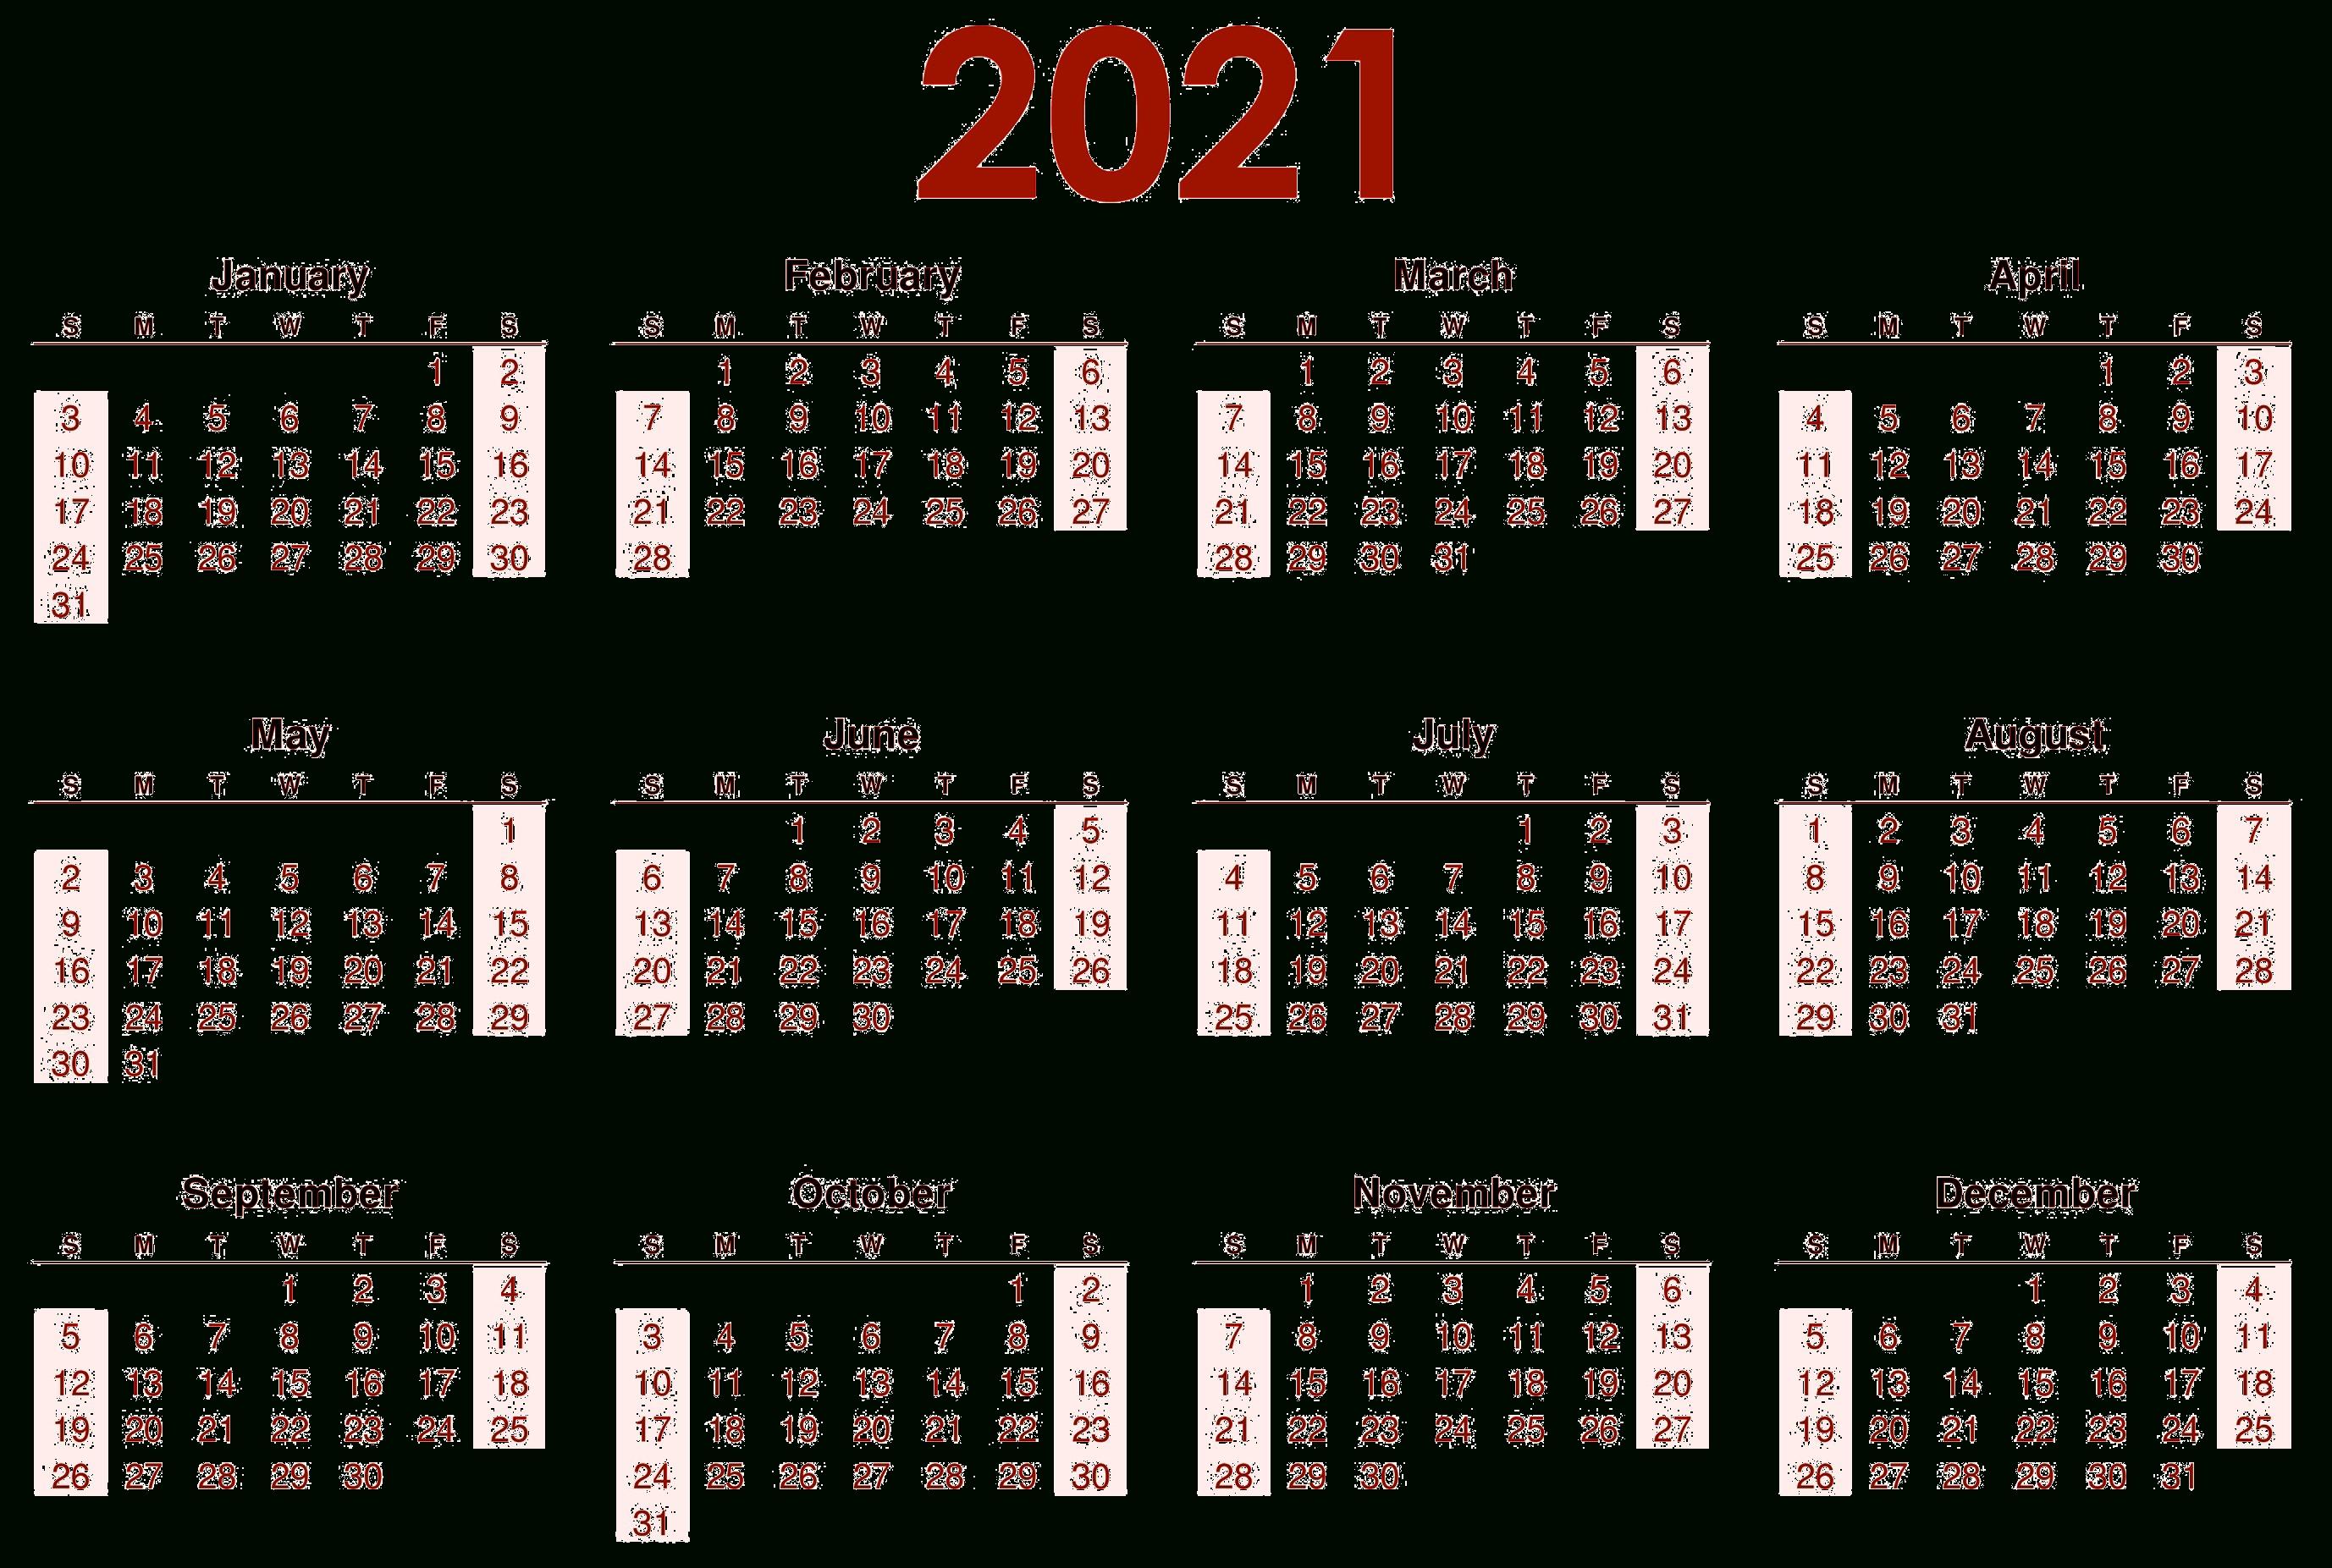 2021 Calendar Wallpapers - Top Free 2021 Calendar Free Calendar Background Templates